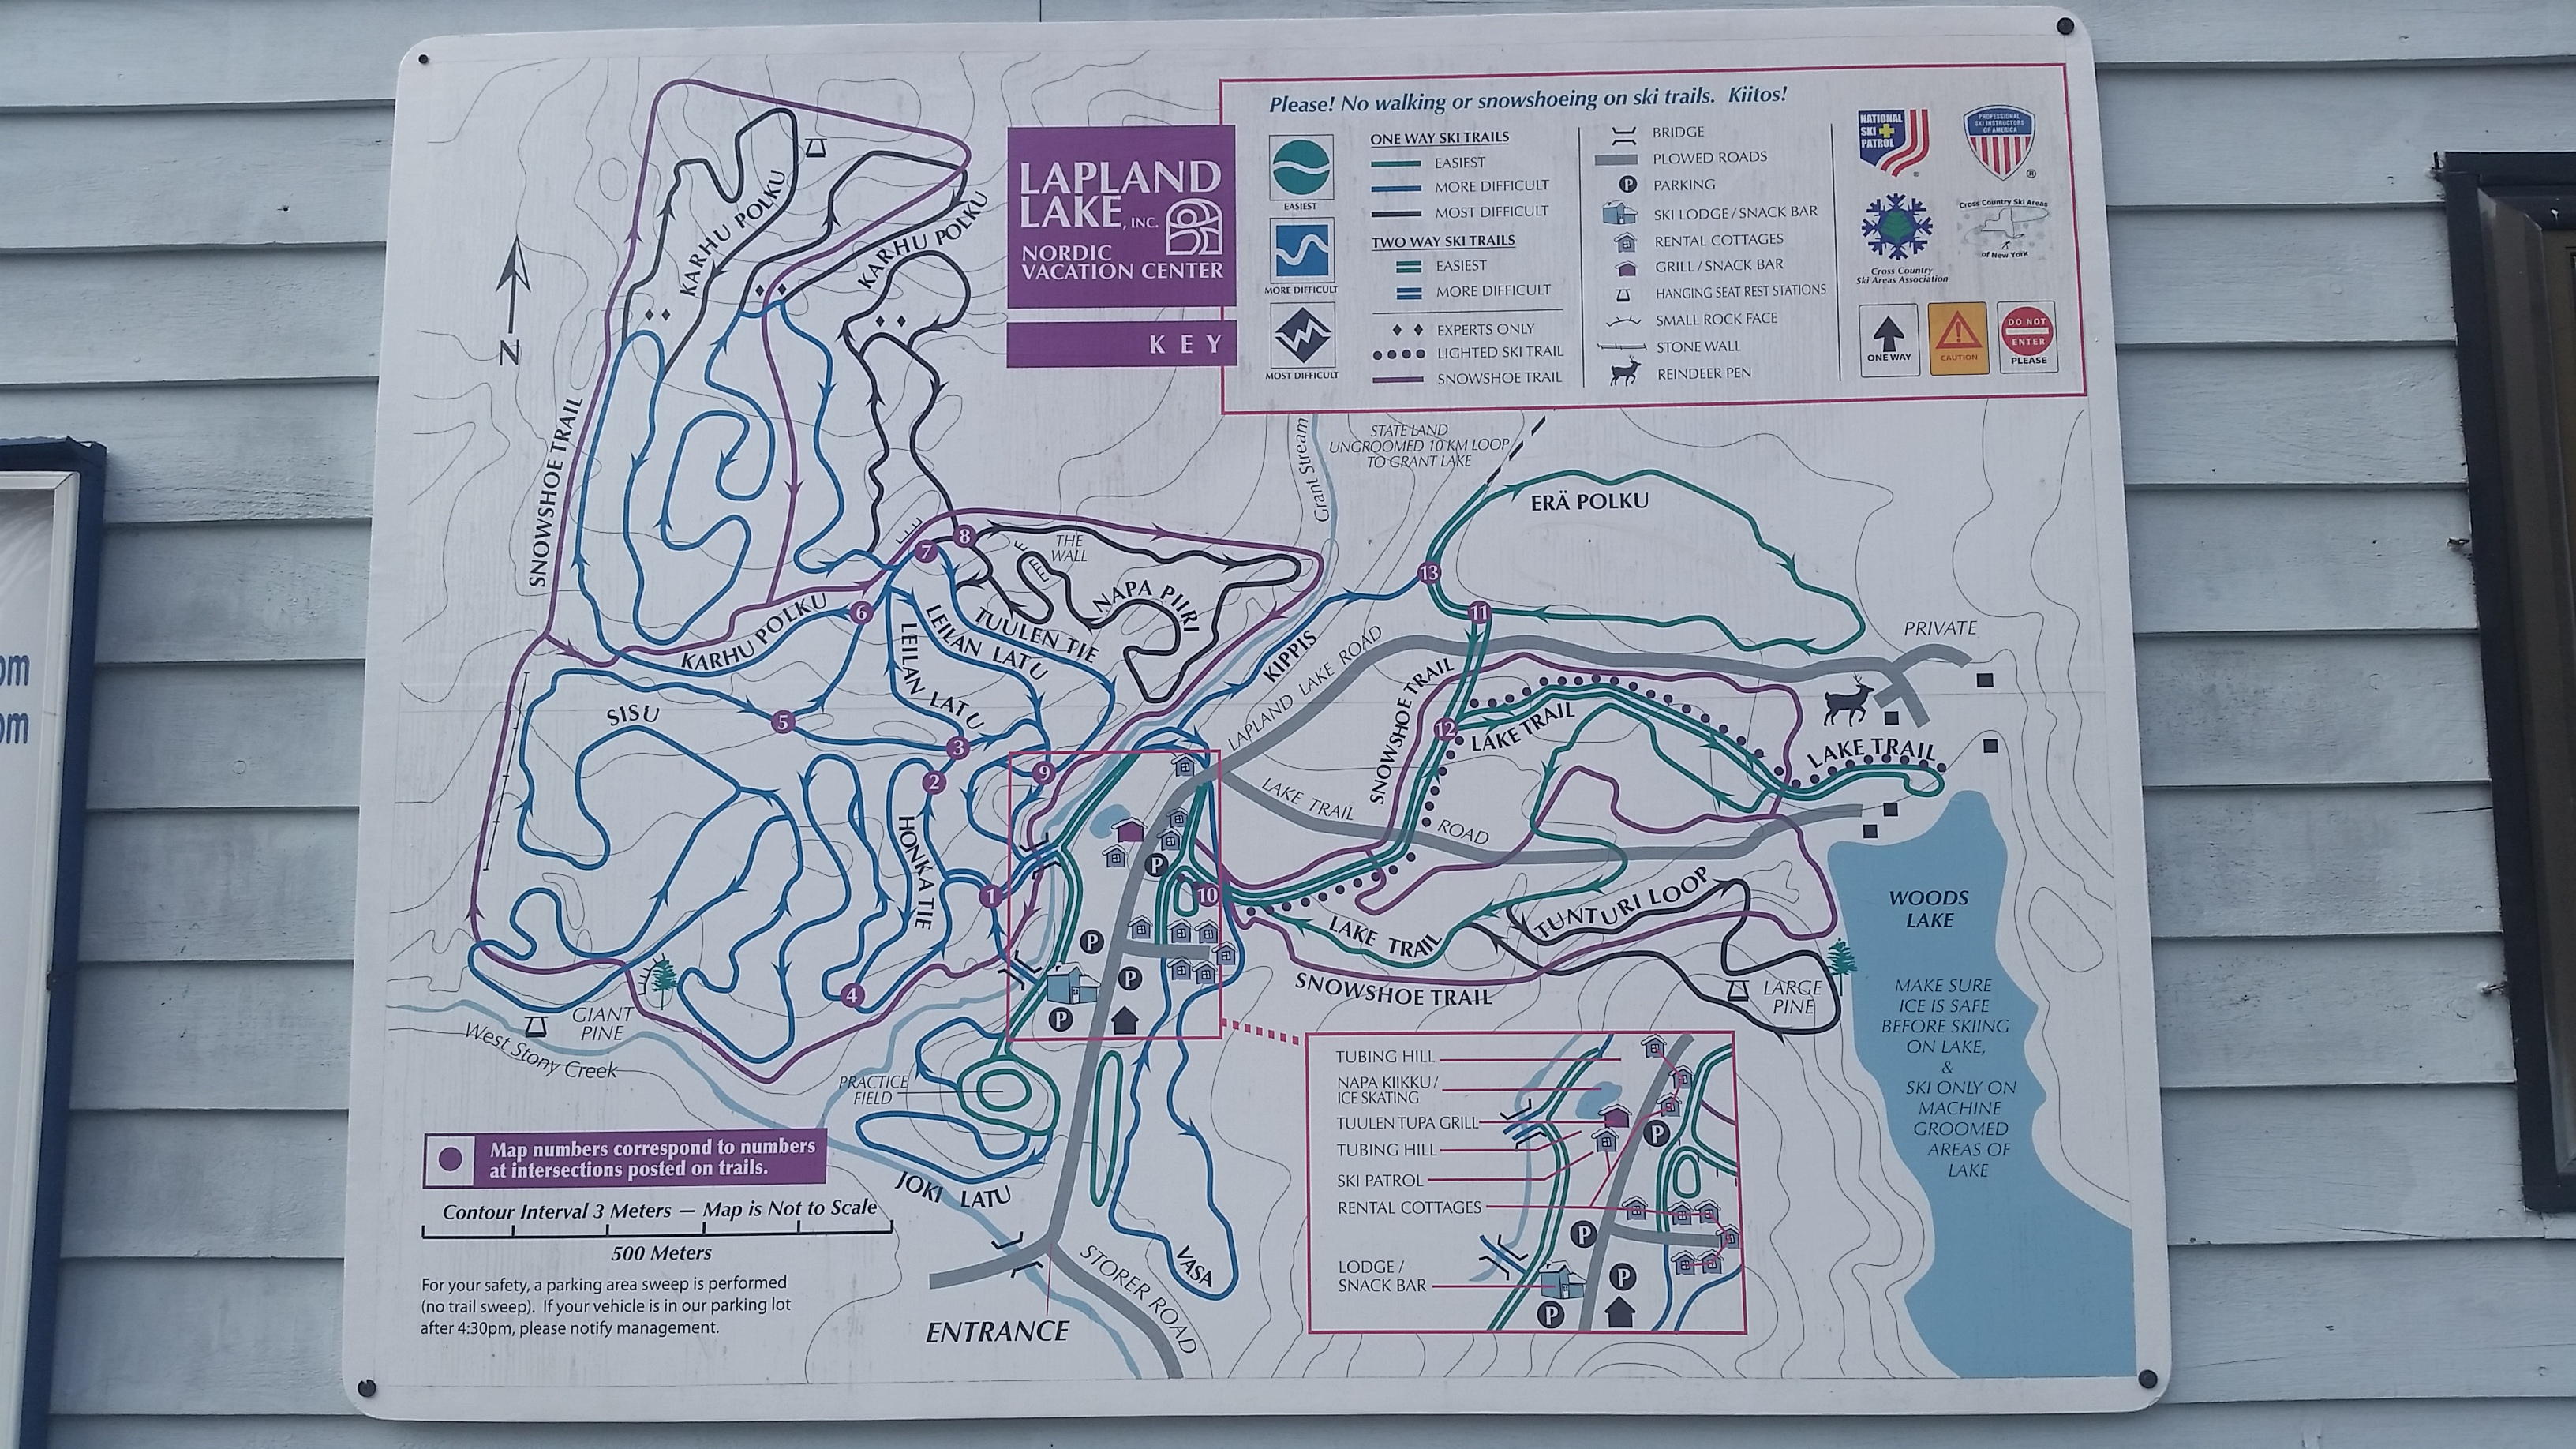 Lapland Lake Trail Map